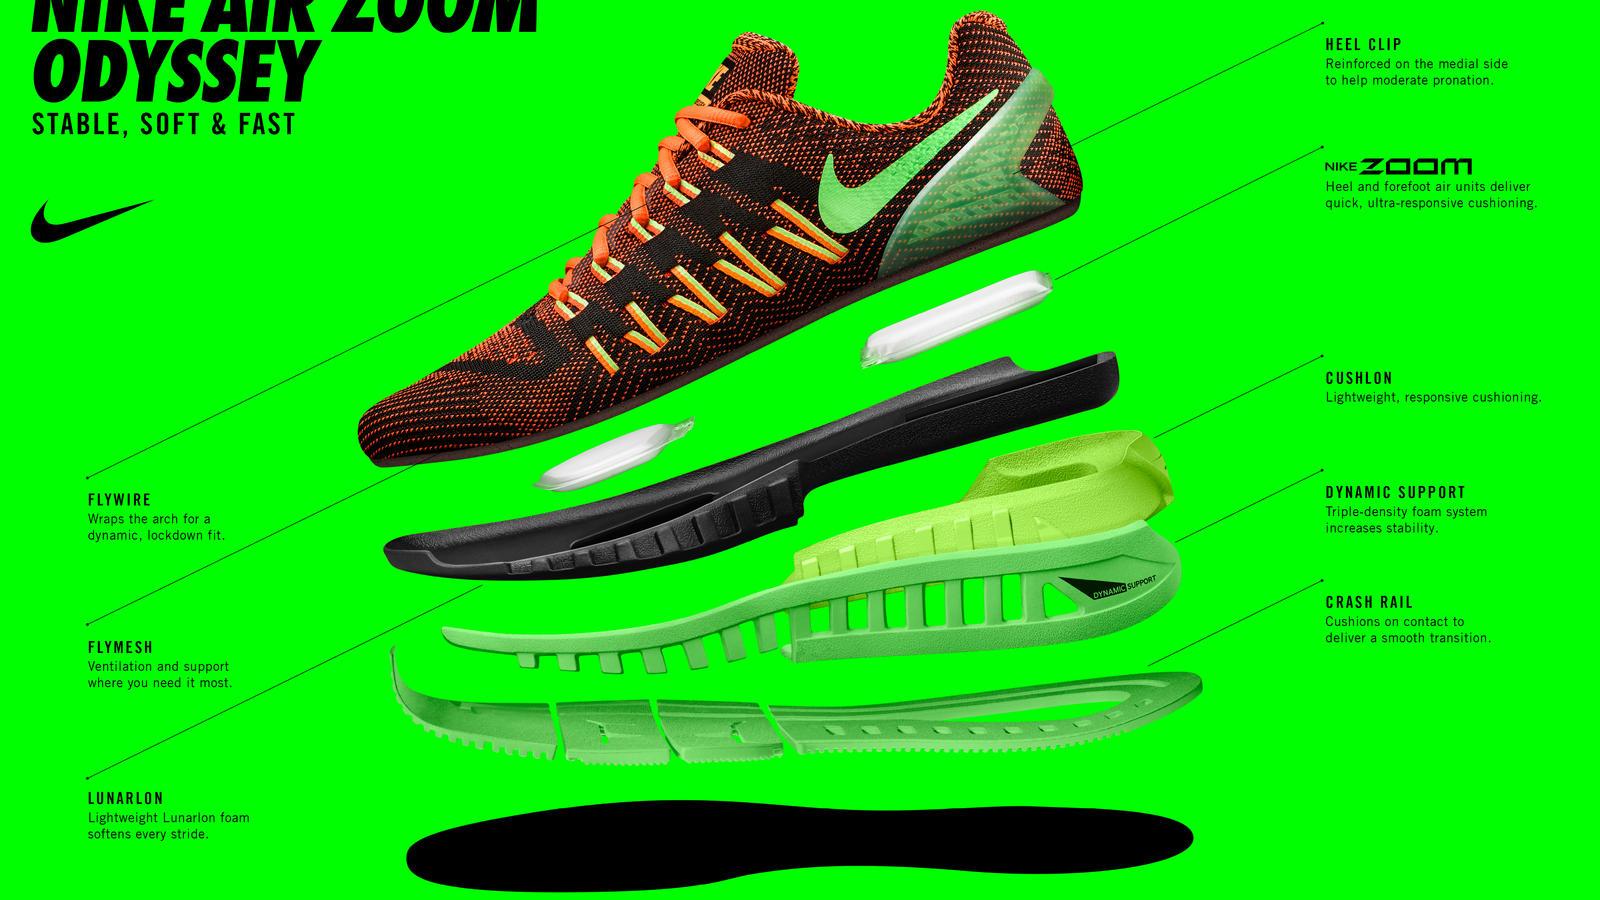 Nike Air Zoom Odyssey men's